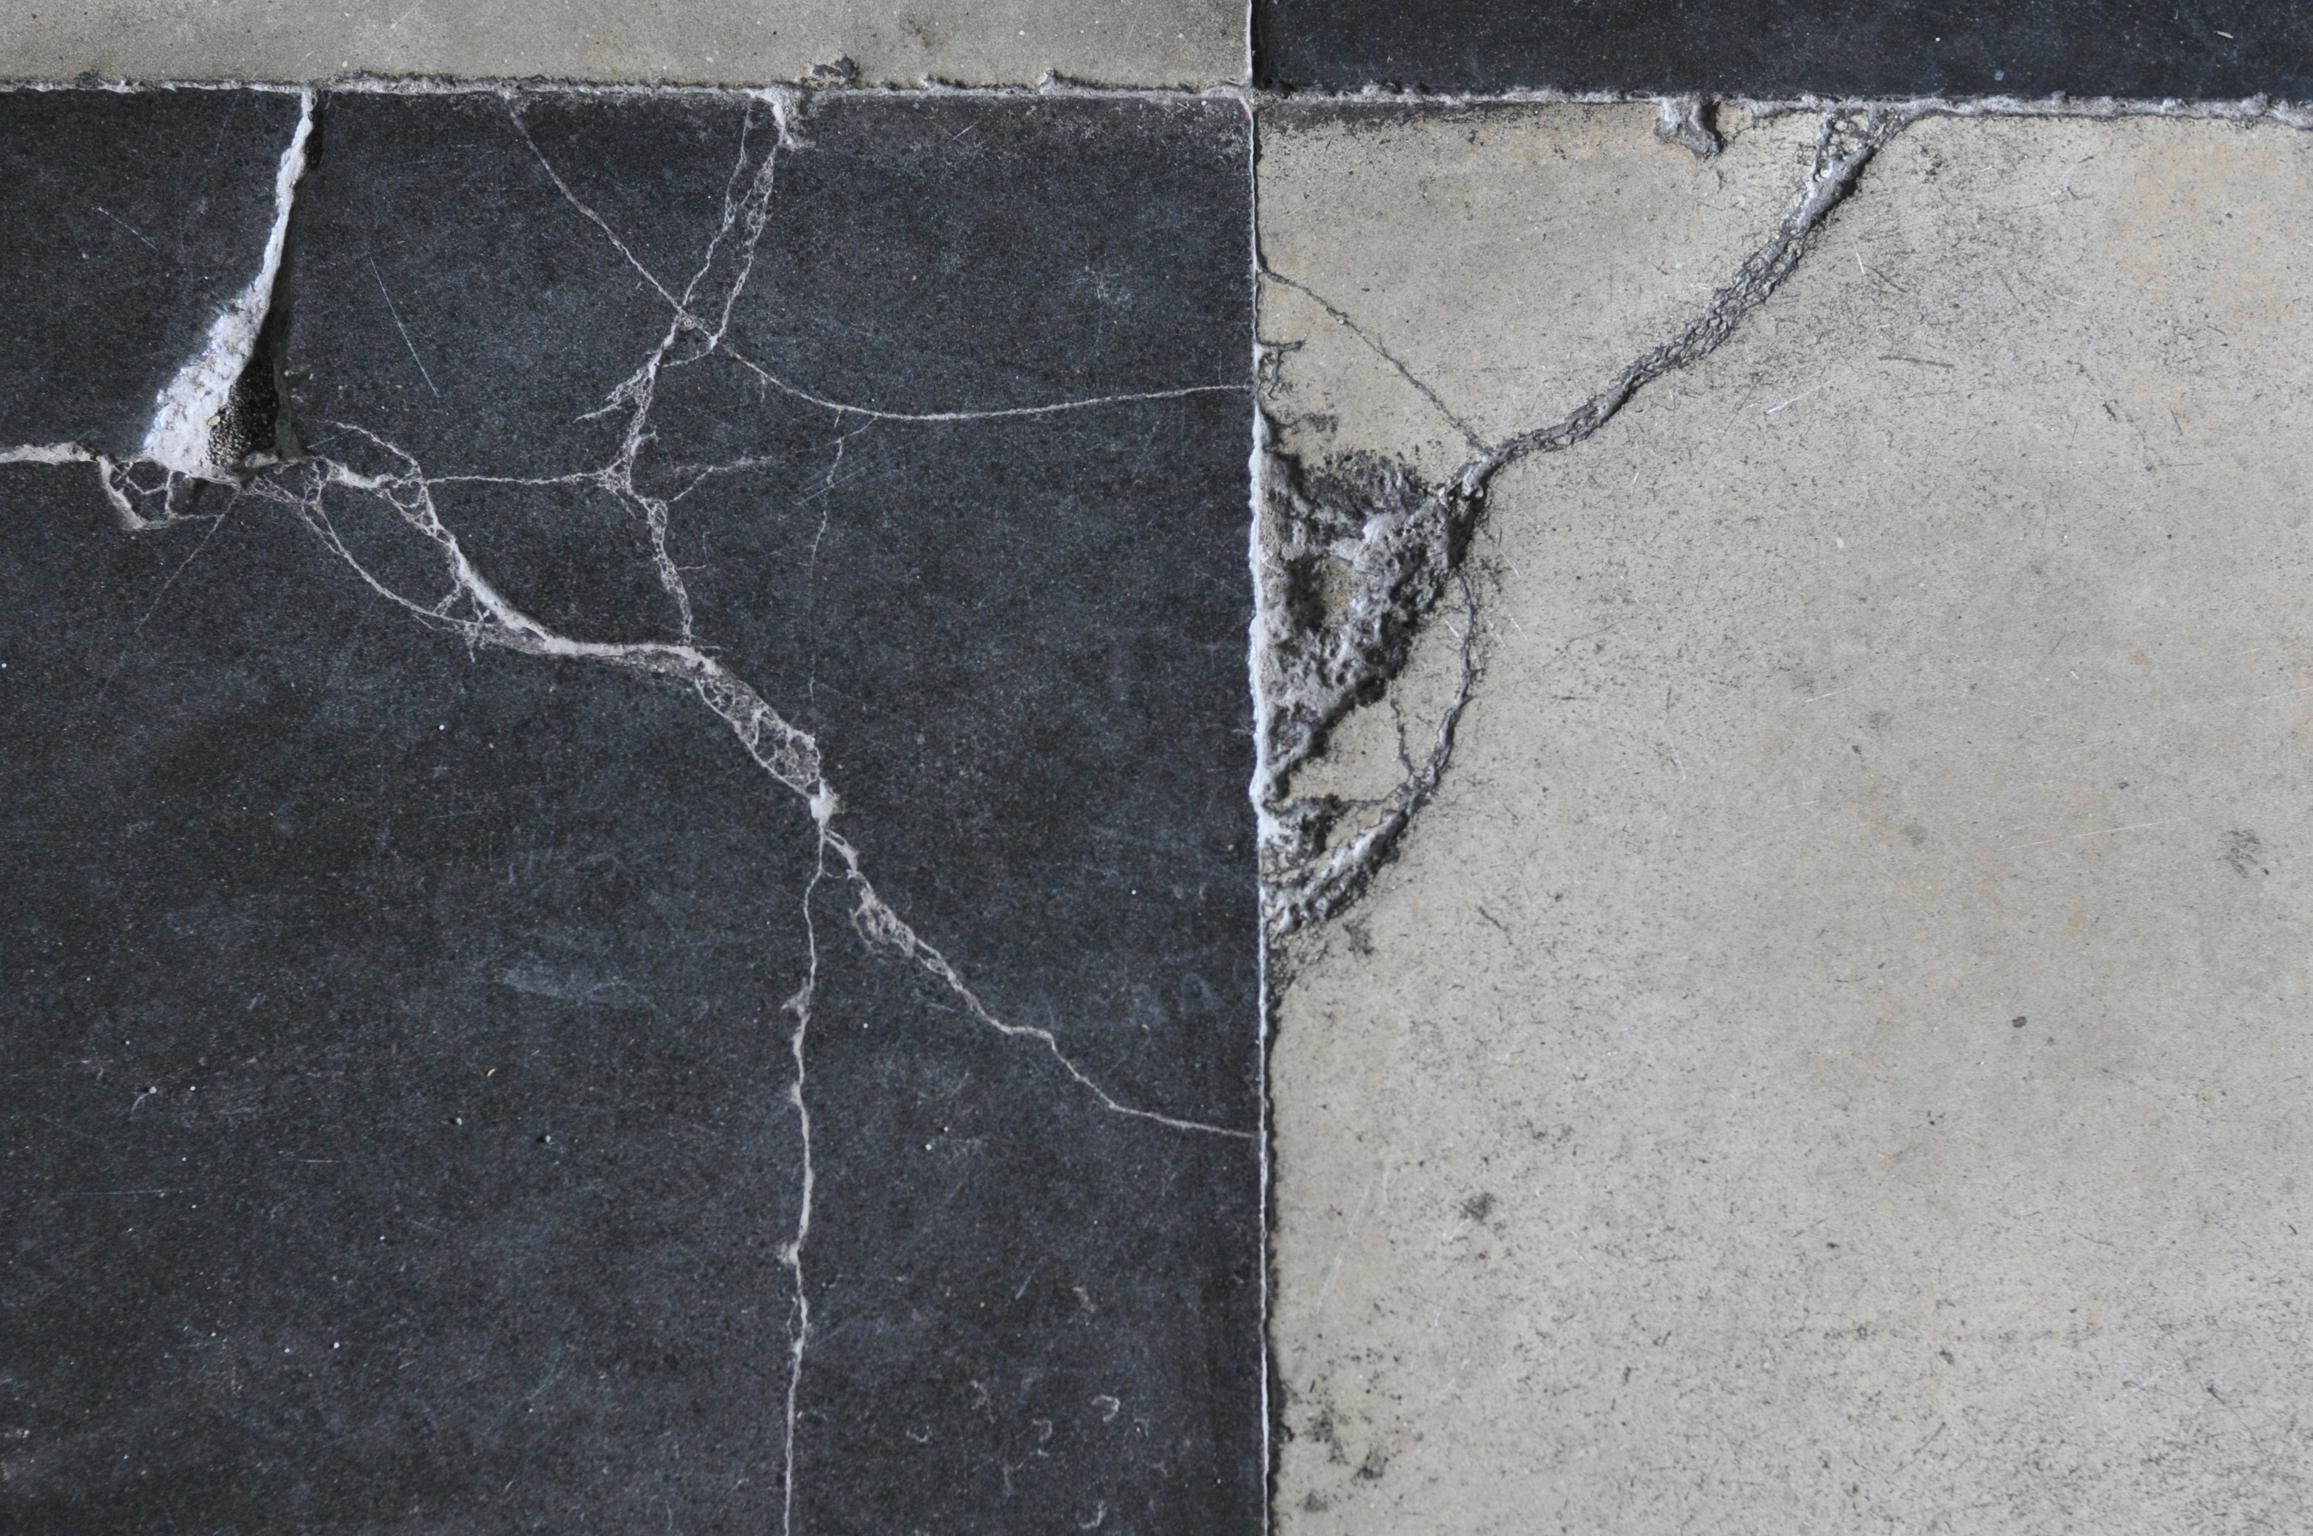 Cracked floor tiles in San Agustin Church, Intramuros, Manila Philippines